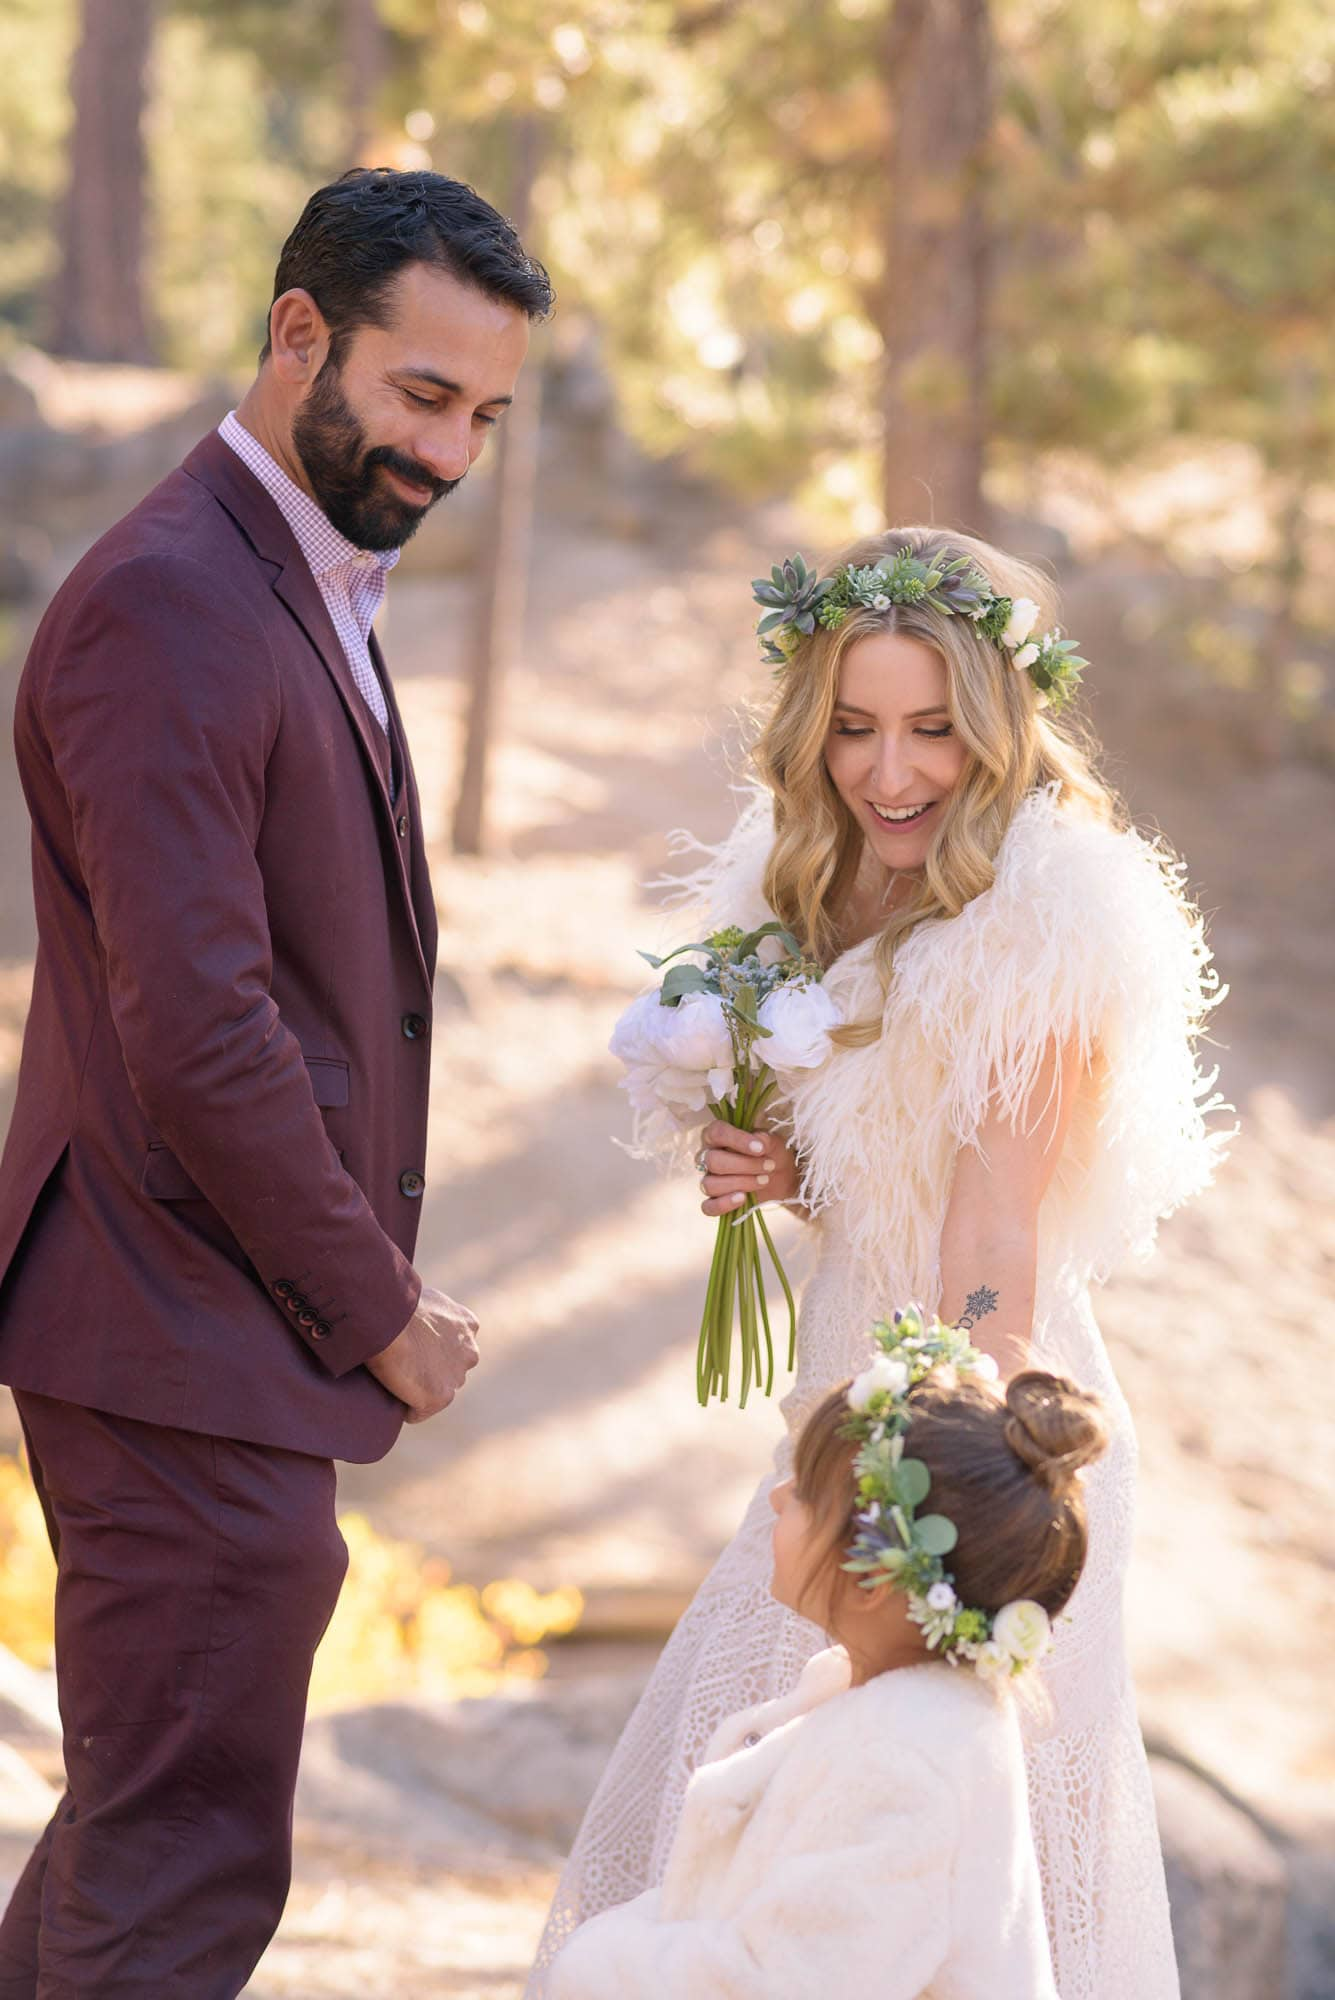 009_Alan_and_Heidi_Wedding_Natalie_Mike